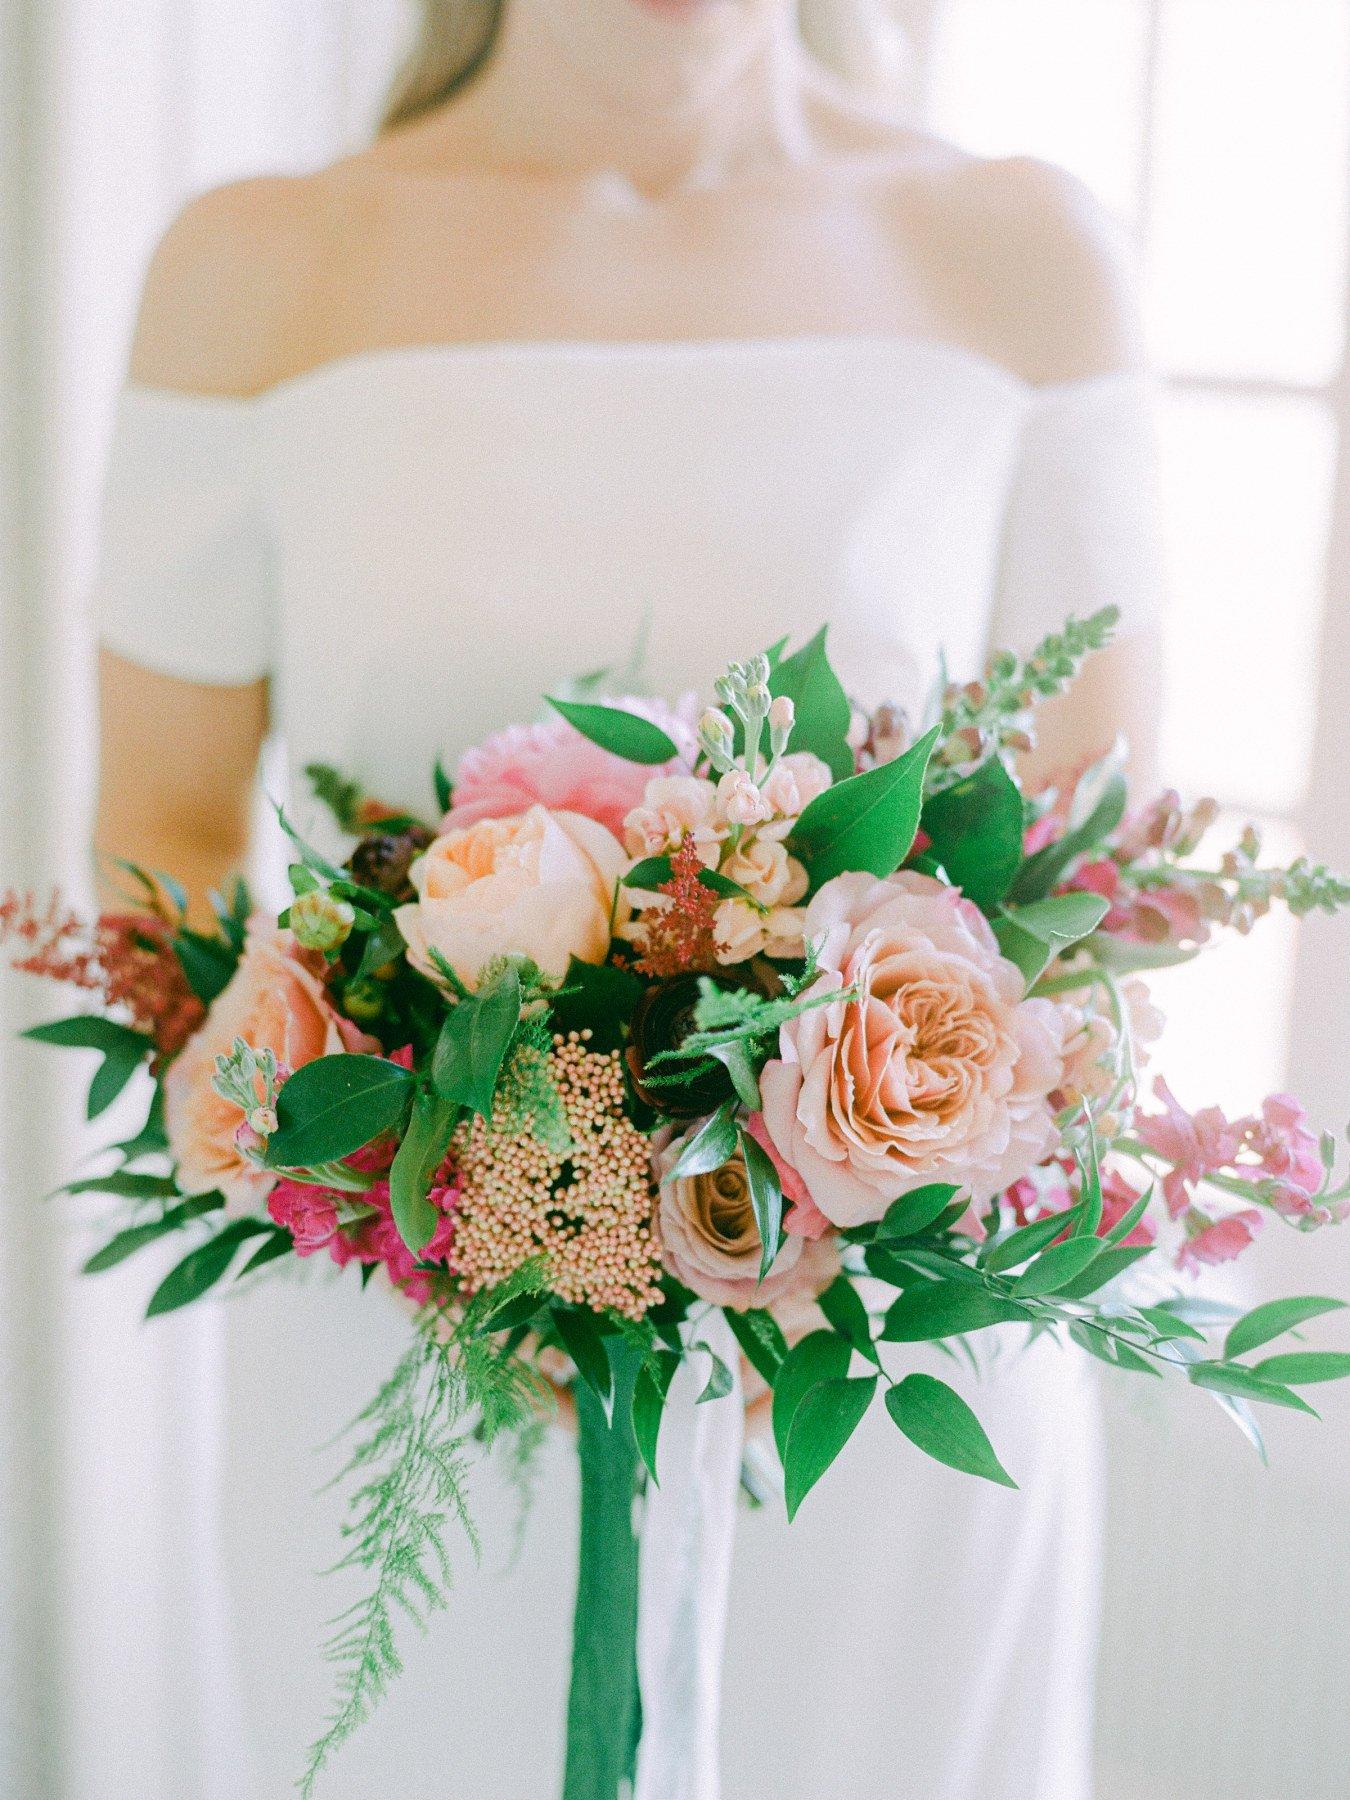 14Great_Marsh_Estates_Wedding_Anne_Kelley_Events_Astrid_Photography146486070005-2